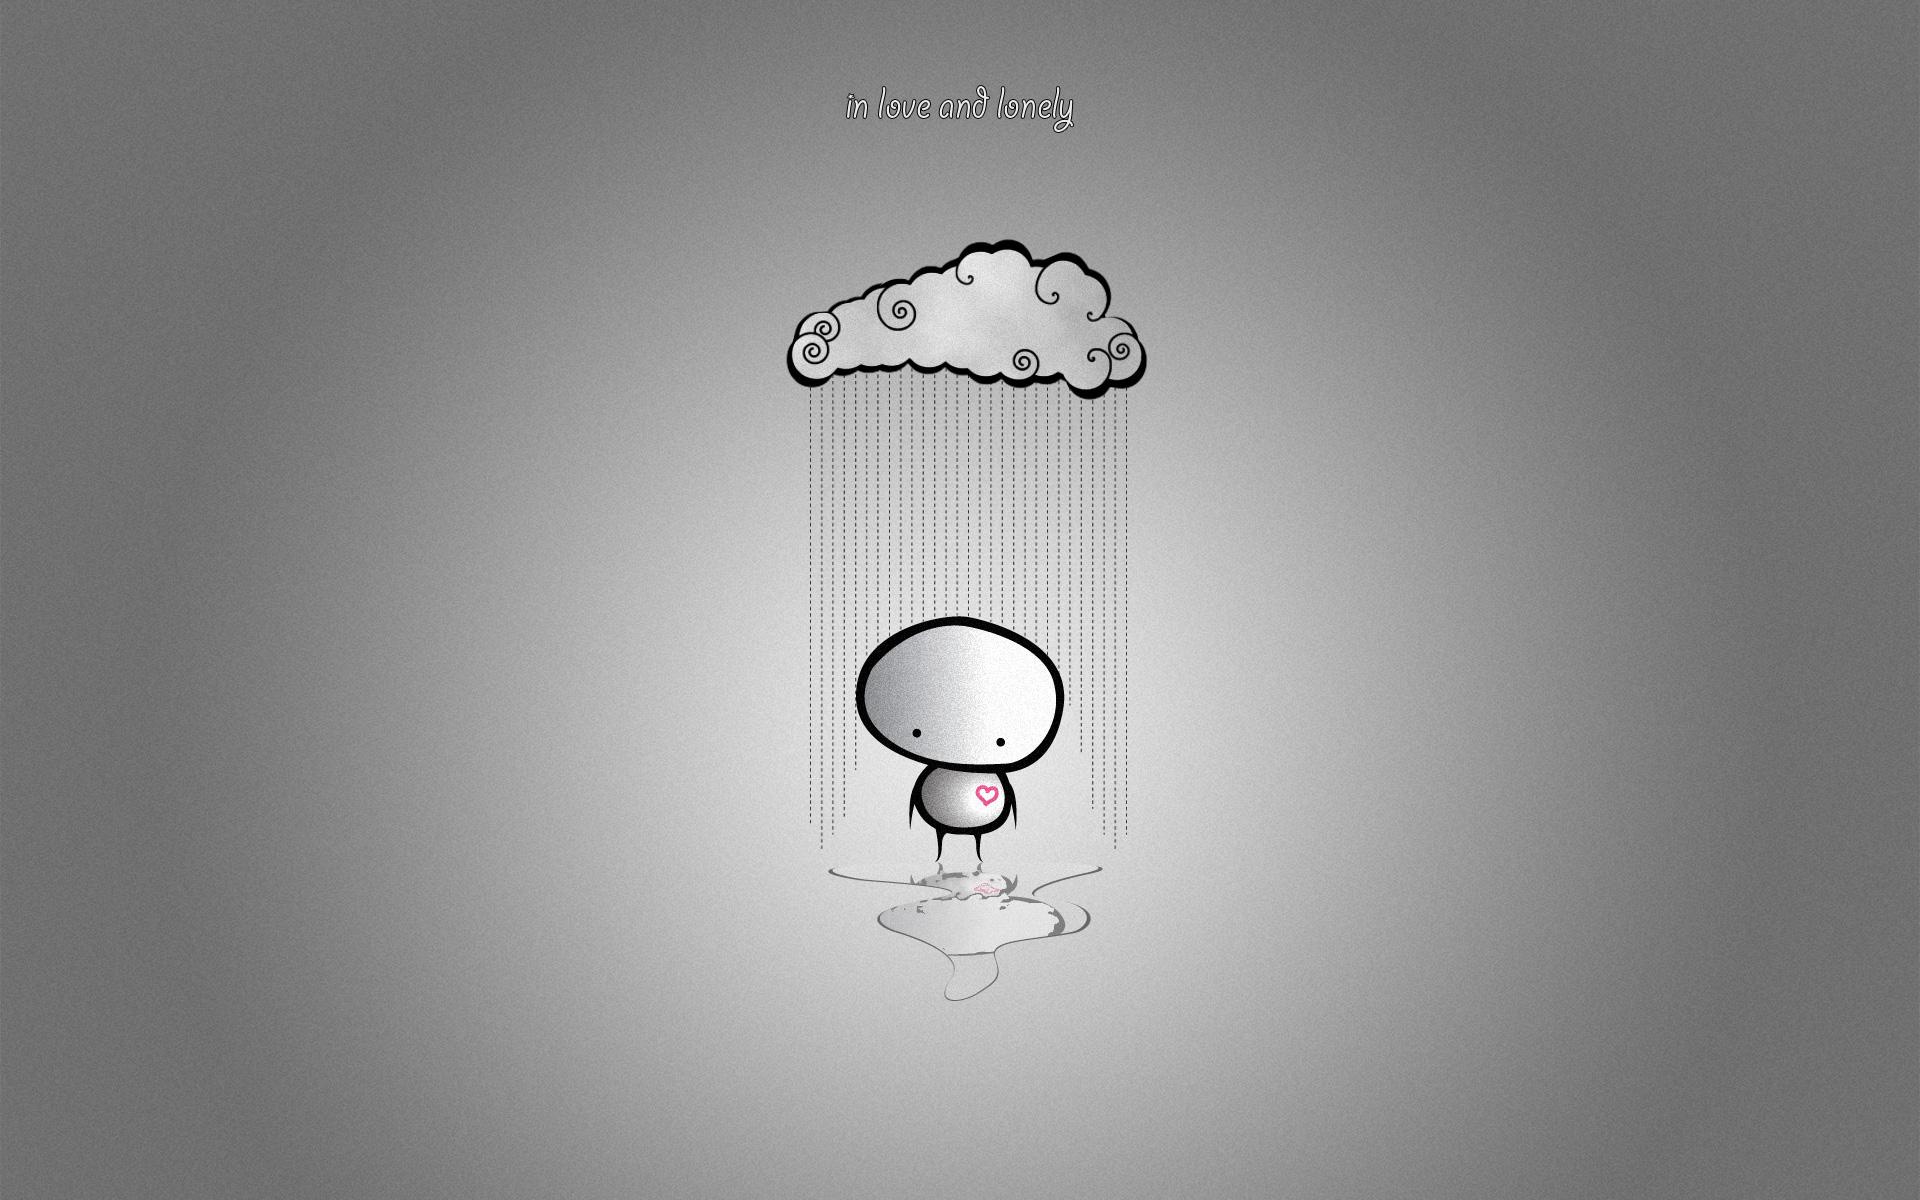 humor funny meme clouds storm rain sad sorrow angry mood